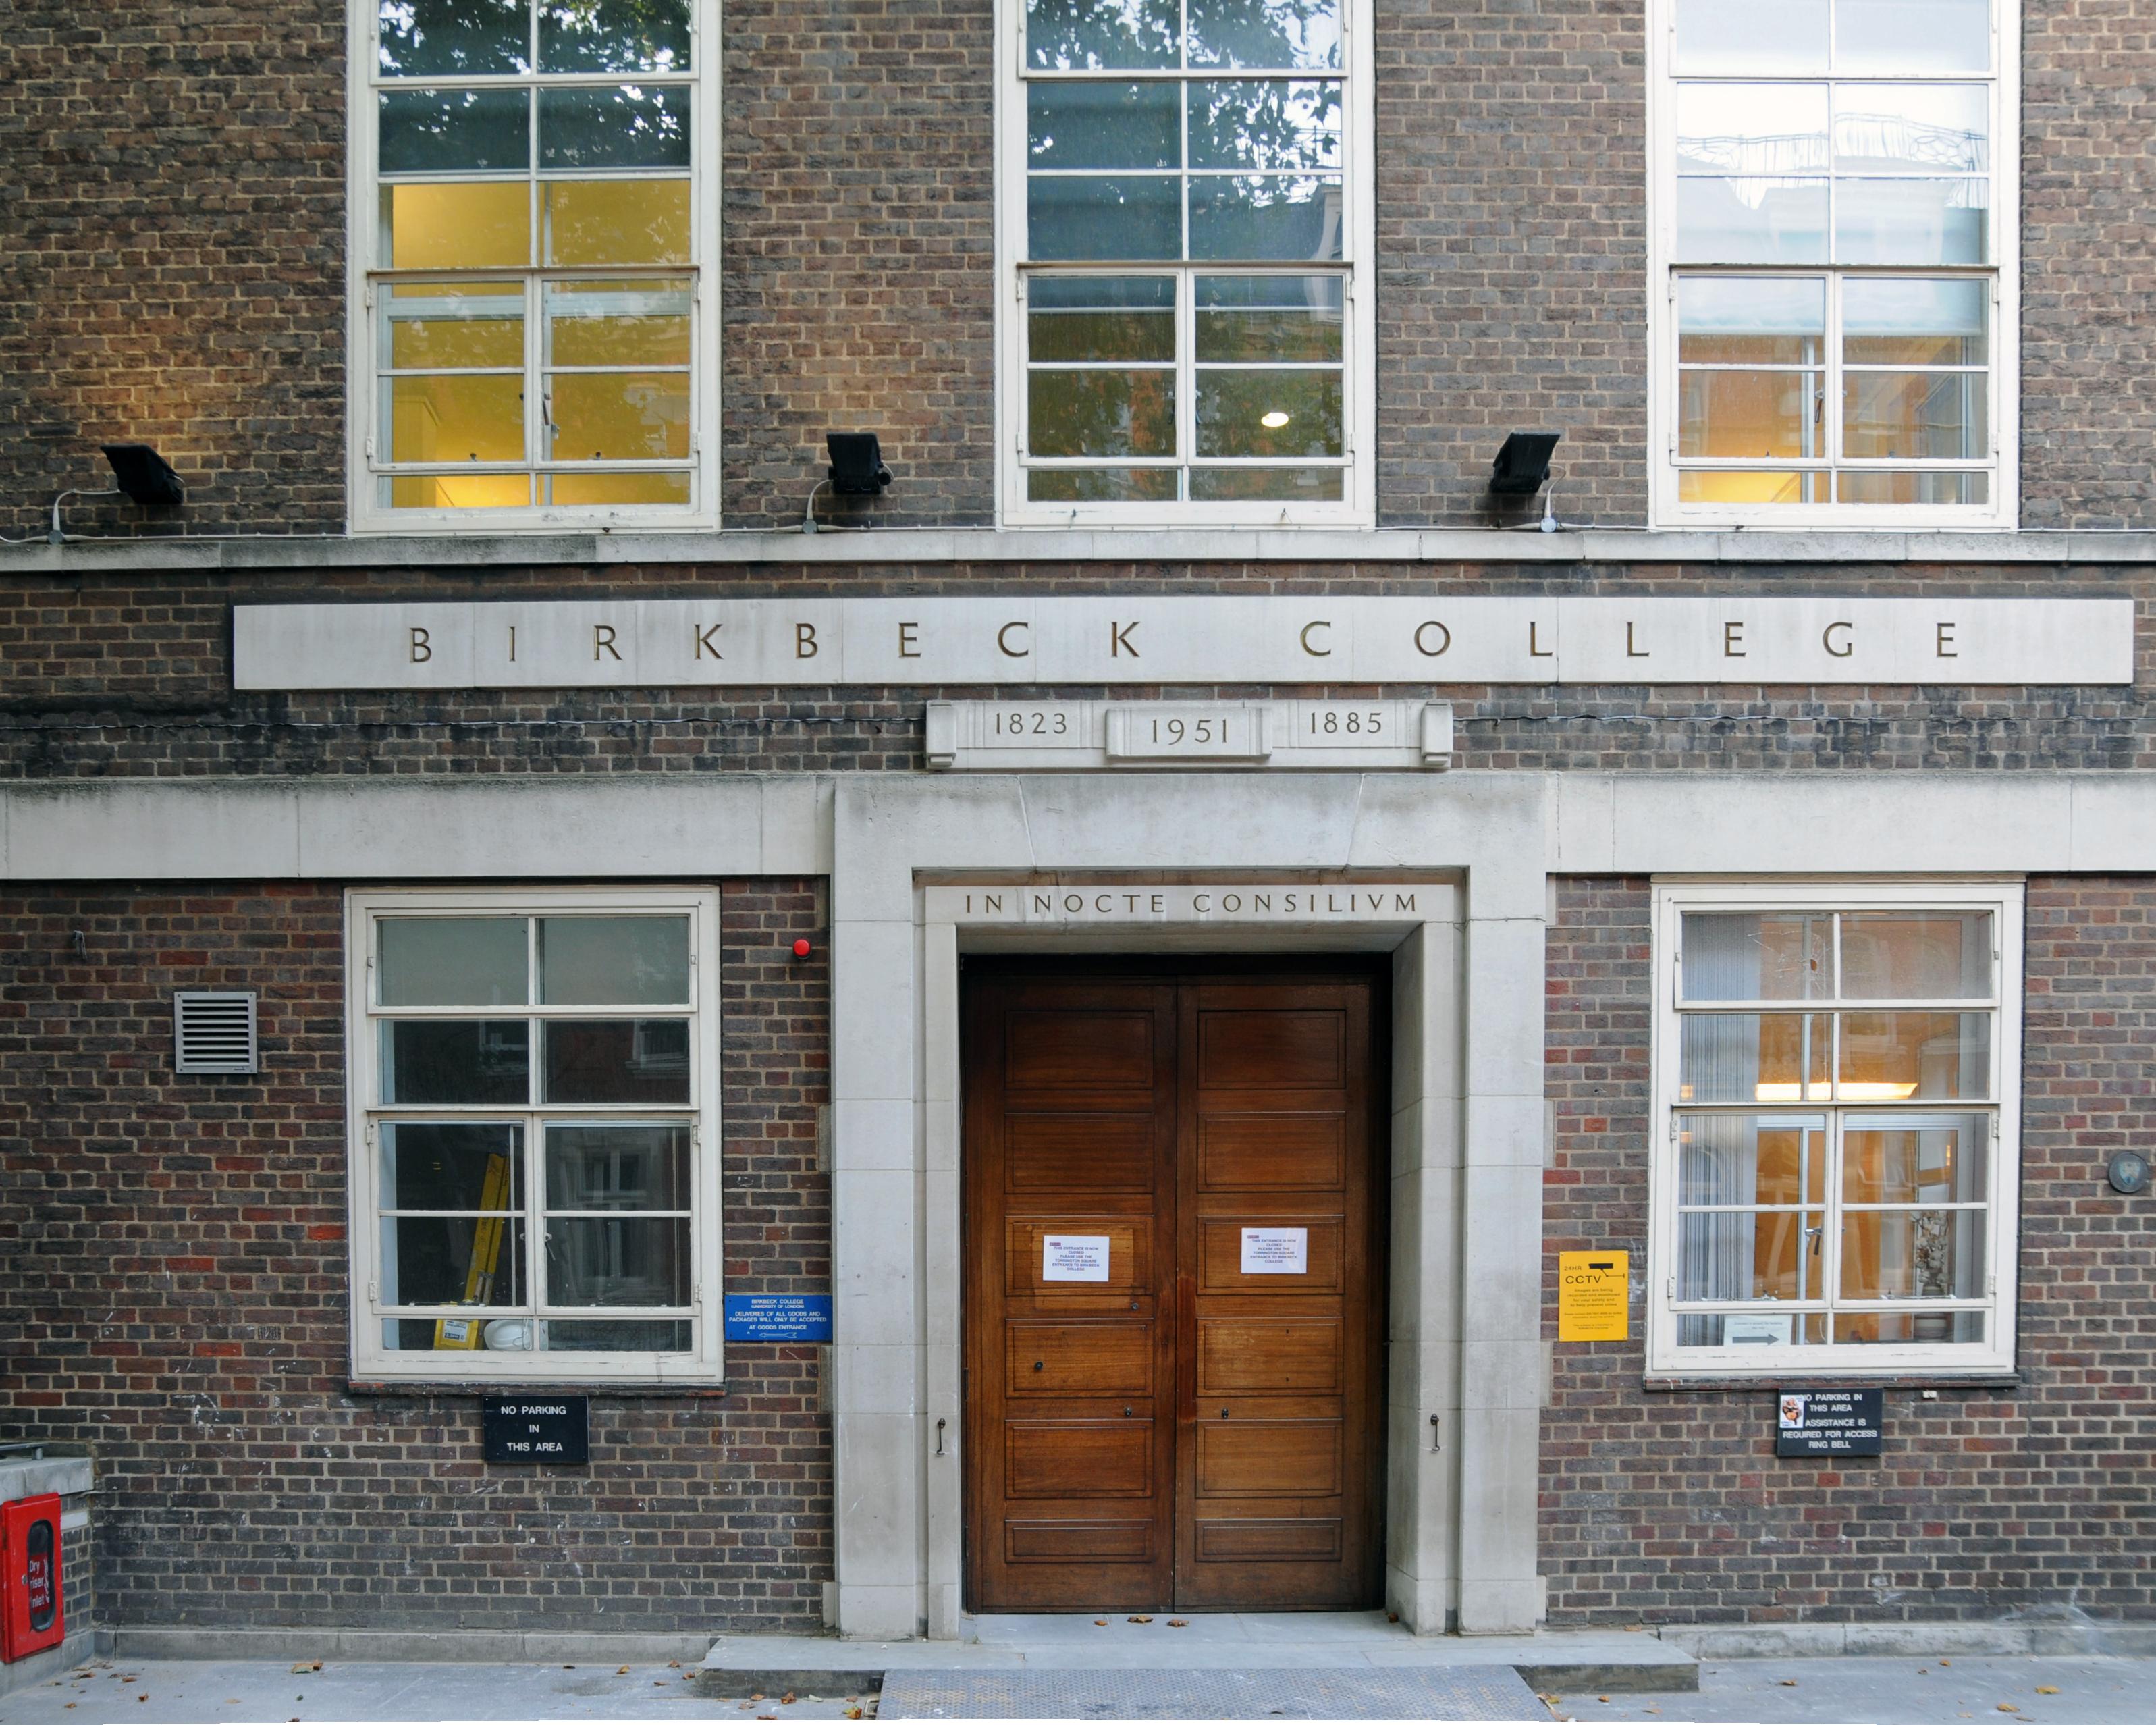 Birkbeck College London